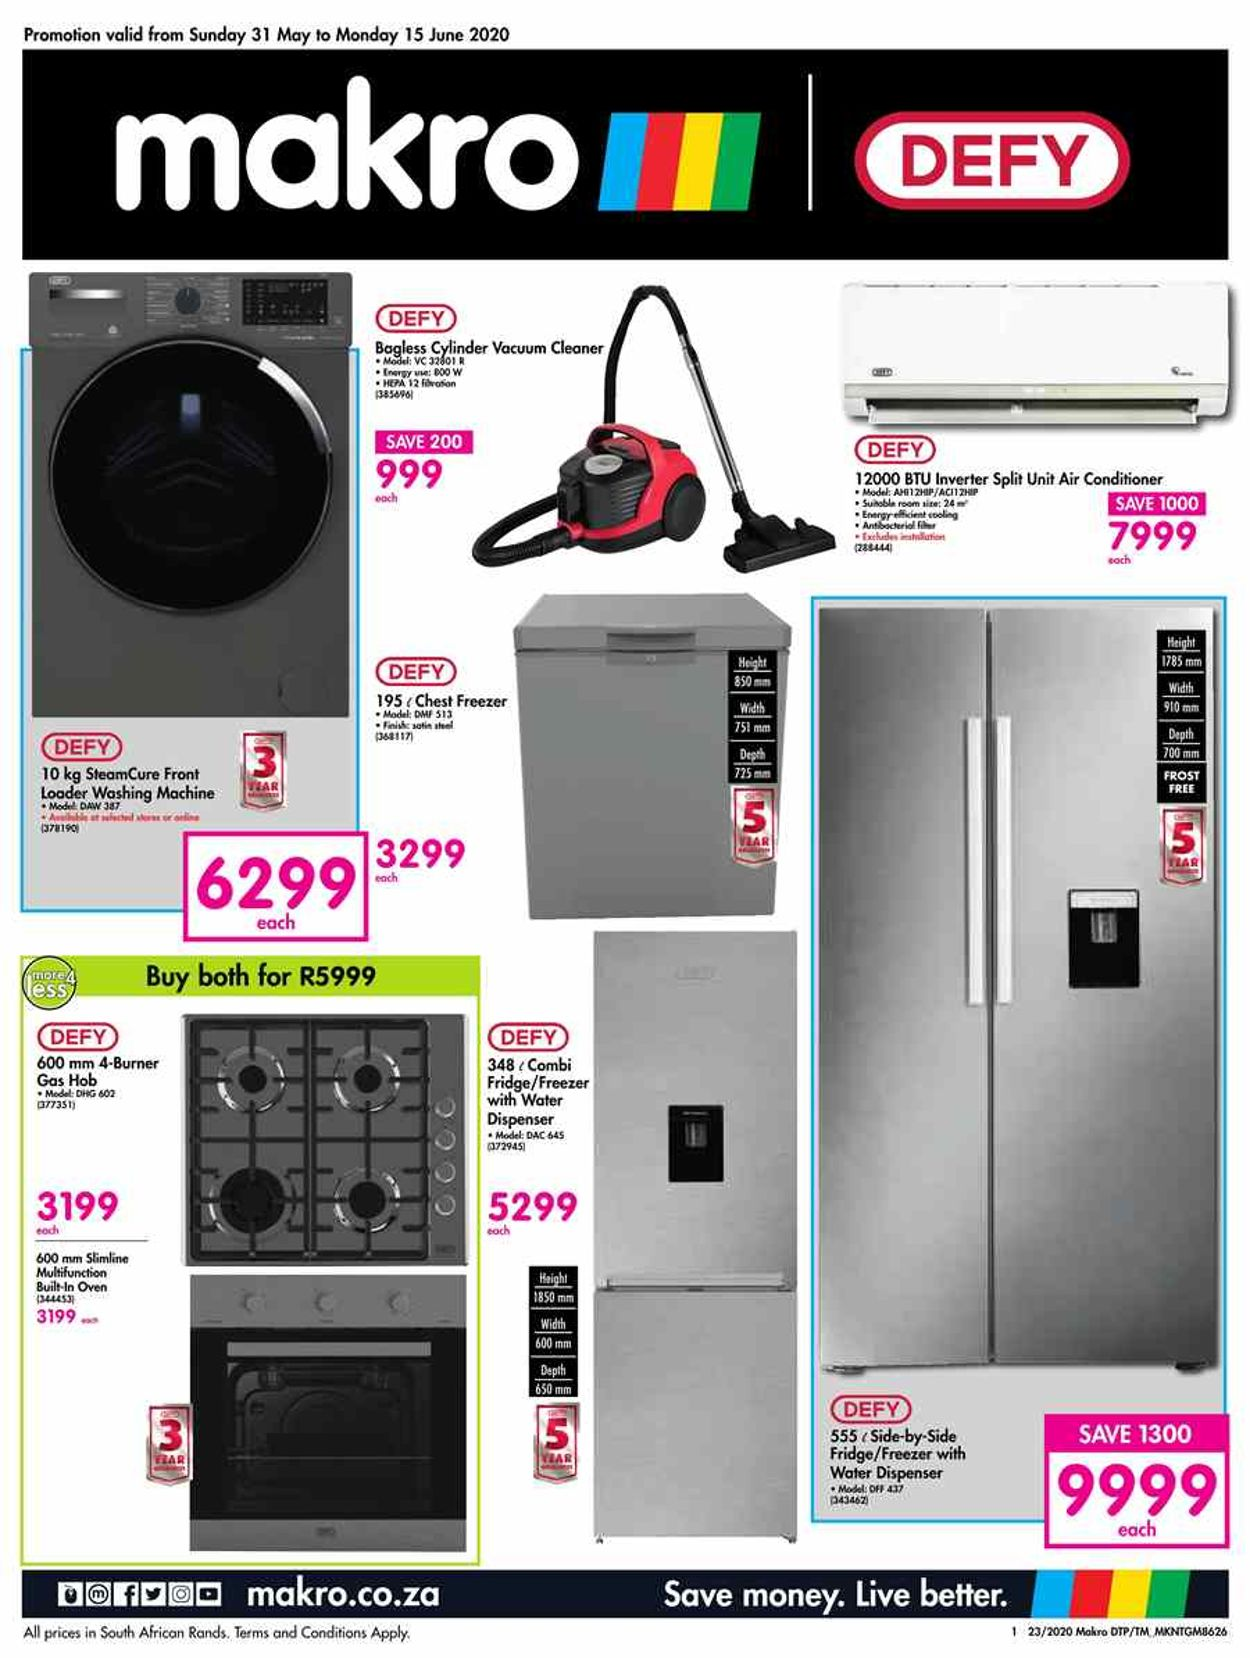 Makro Catalogue - 2020/05/31-2020/06/15